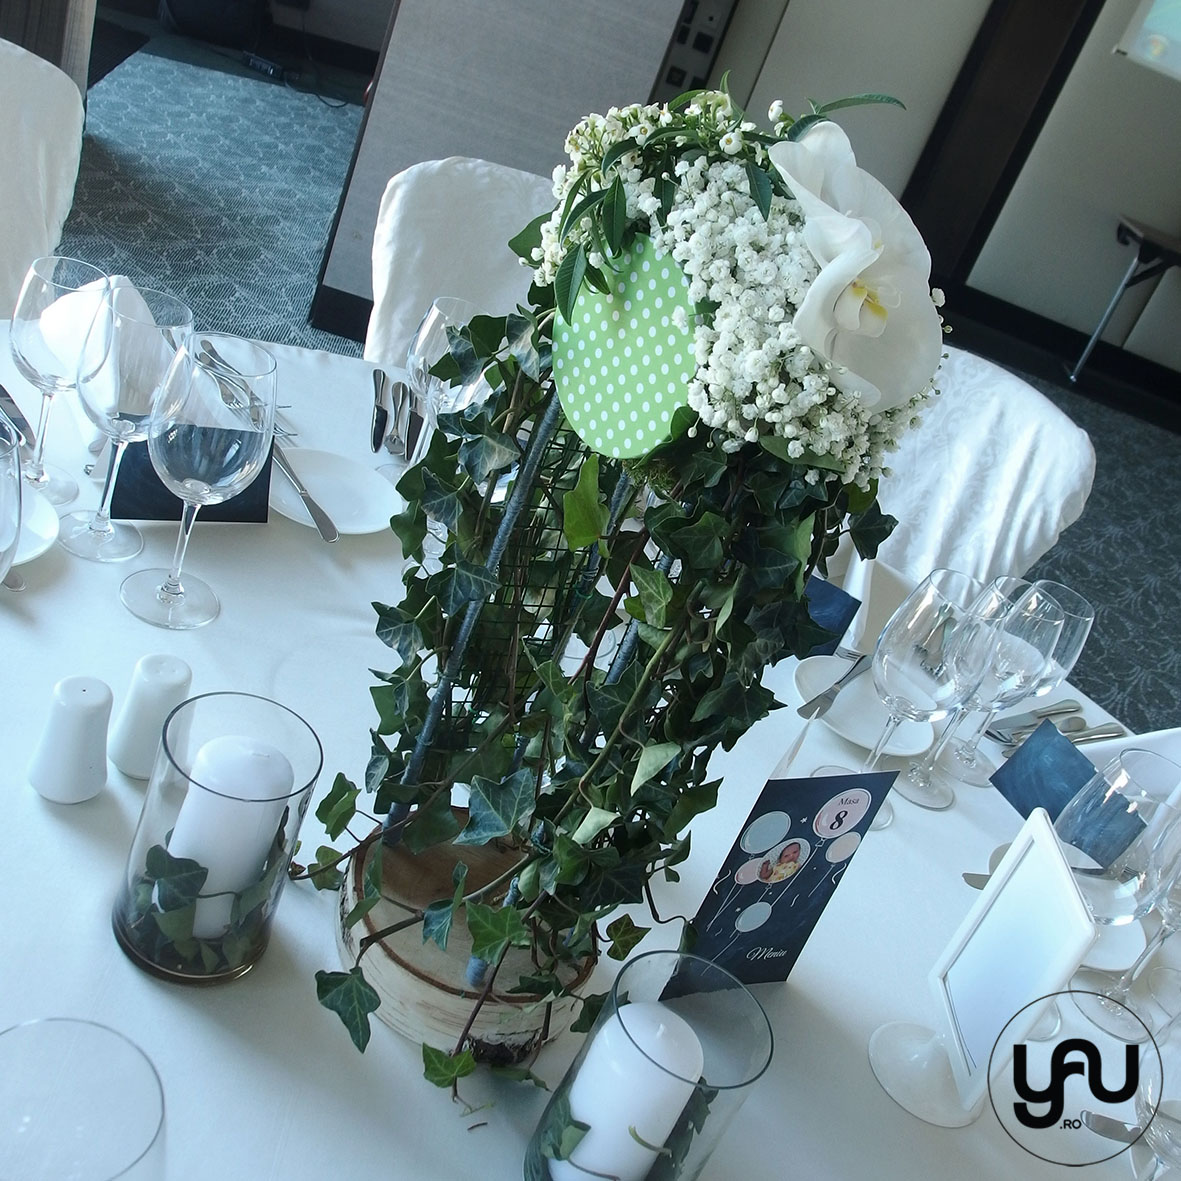 nunta-si-botez-cu-flori-albe-linie-punct-_-yau-events-2016-_-hotel-intercontinental-_-elenatoader-25